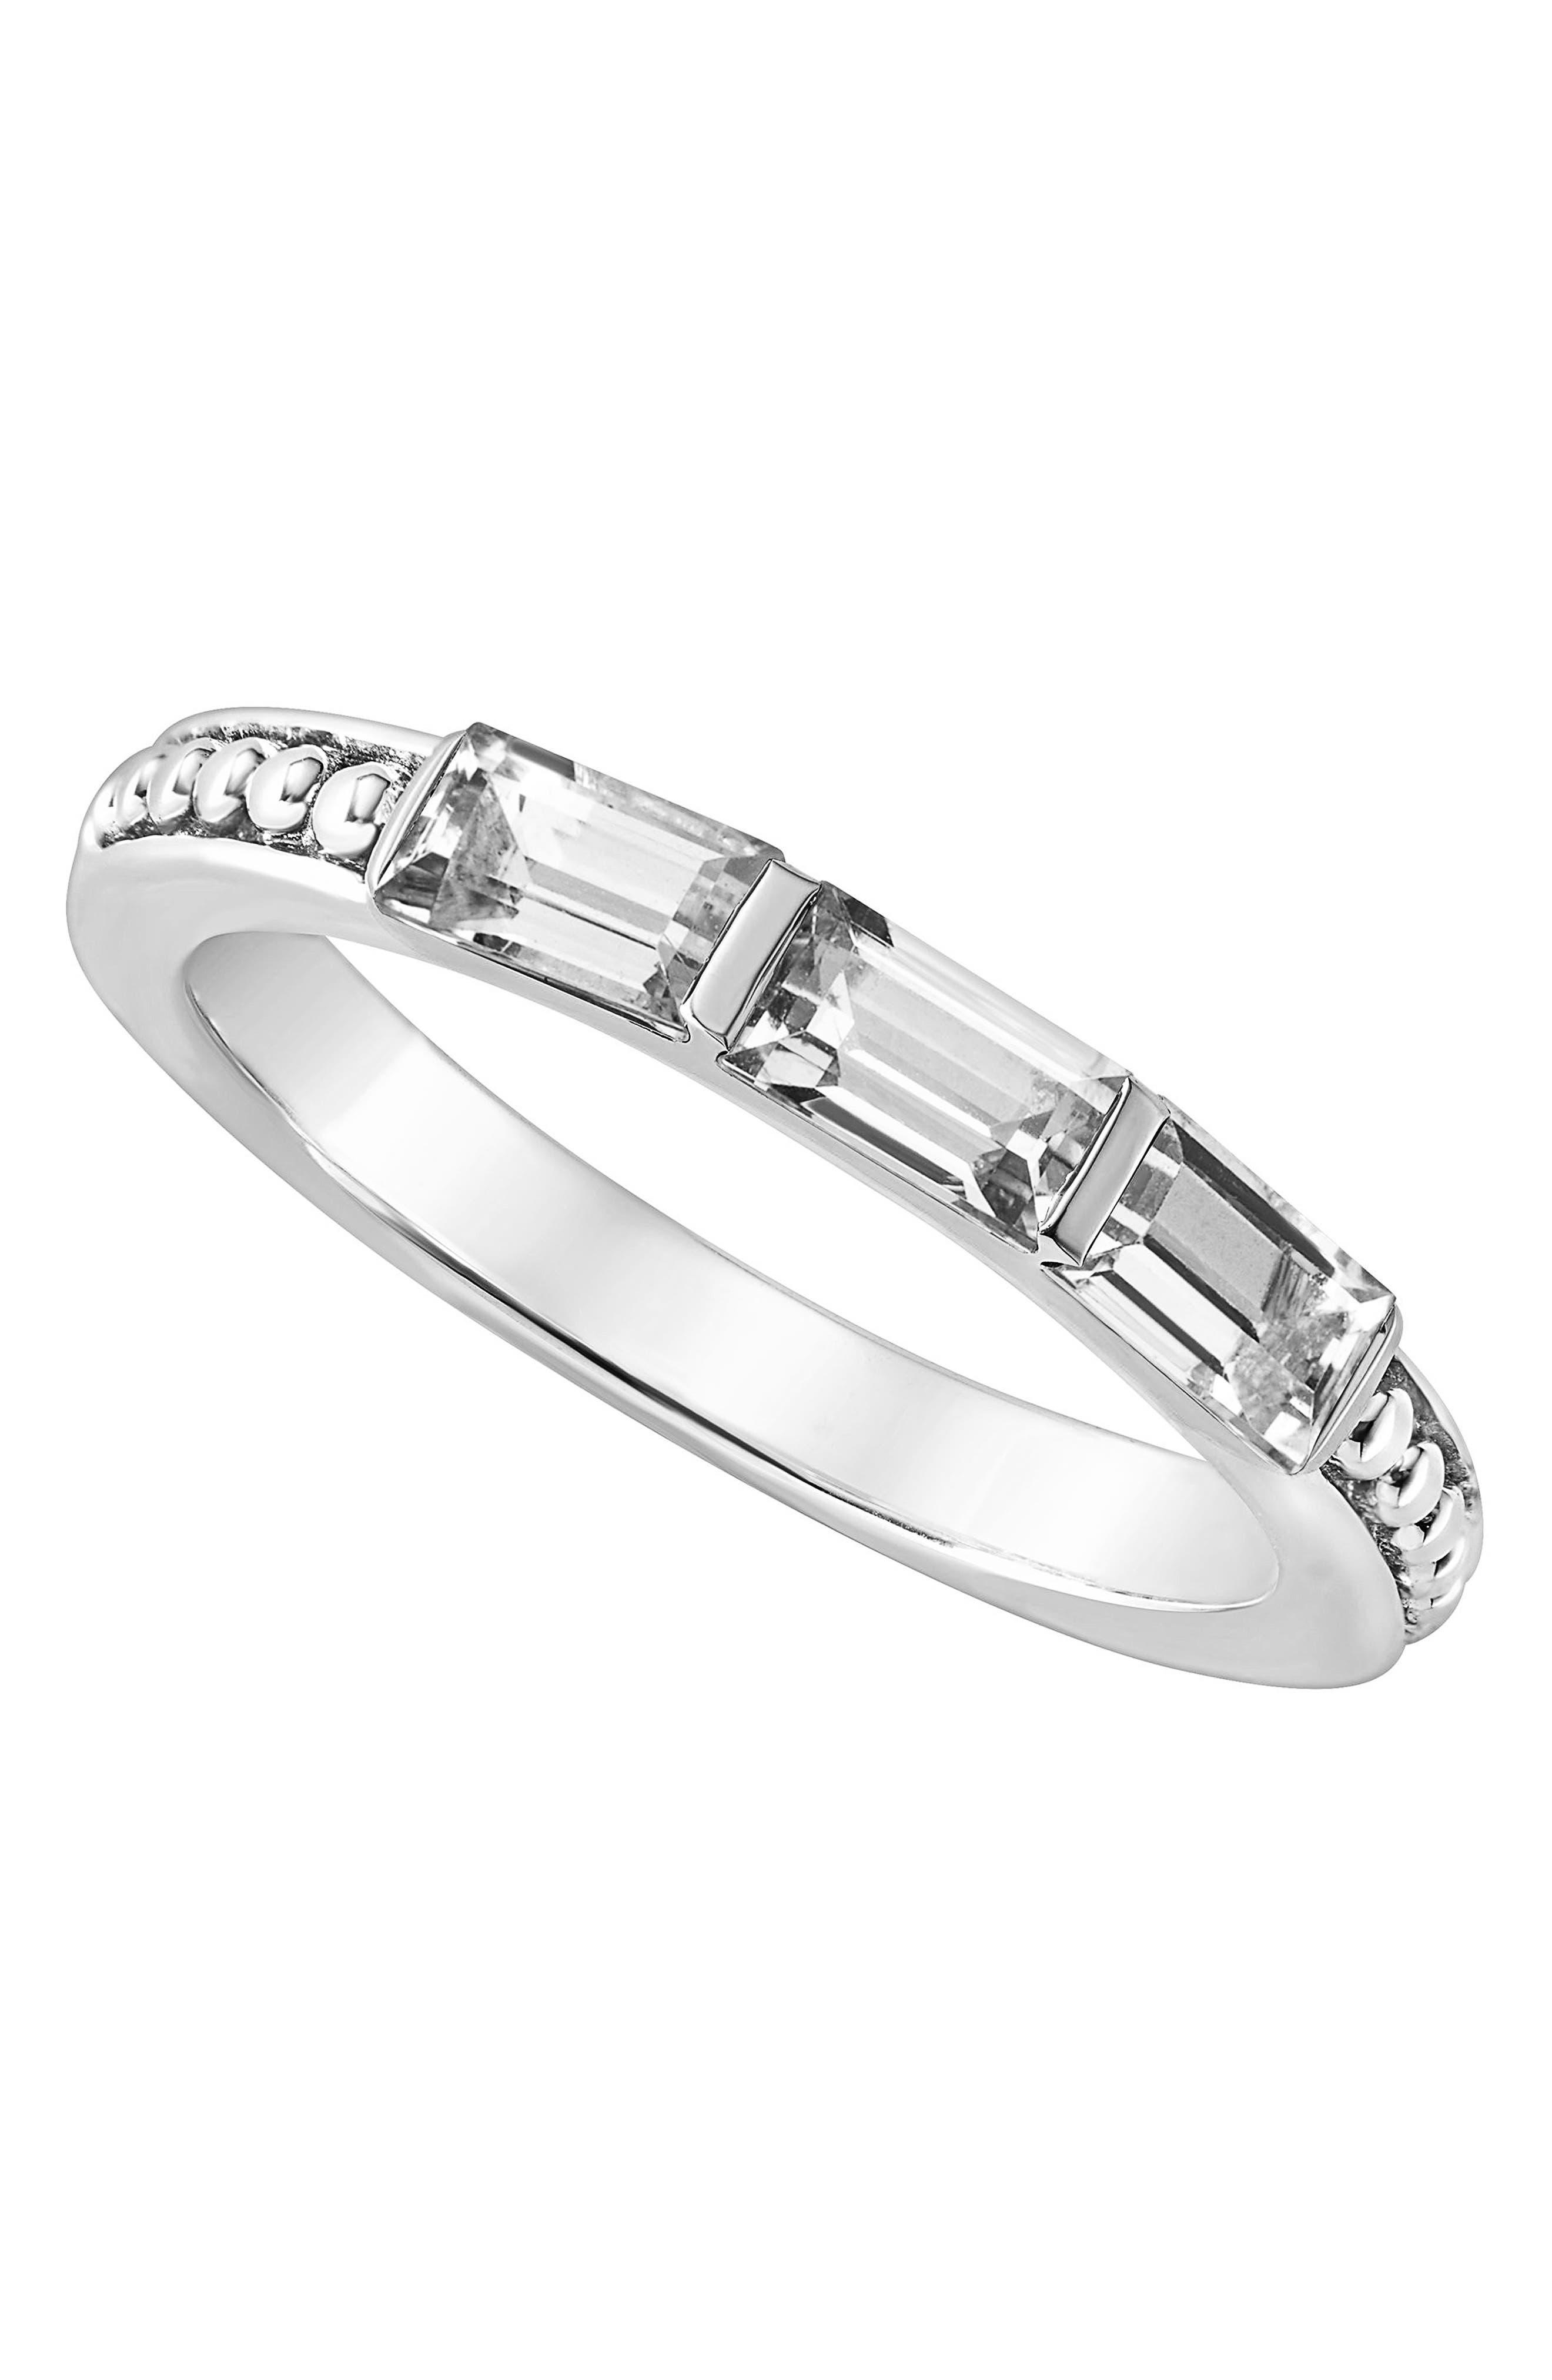 Gemstone Baguette Stackable Ring,                             Alternate thumbnail 4, color,                             SILVER/ 18K GOLD/ WHITE TOPAZ